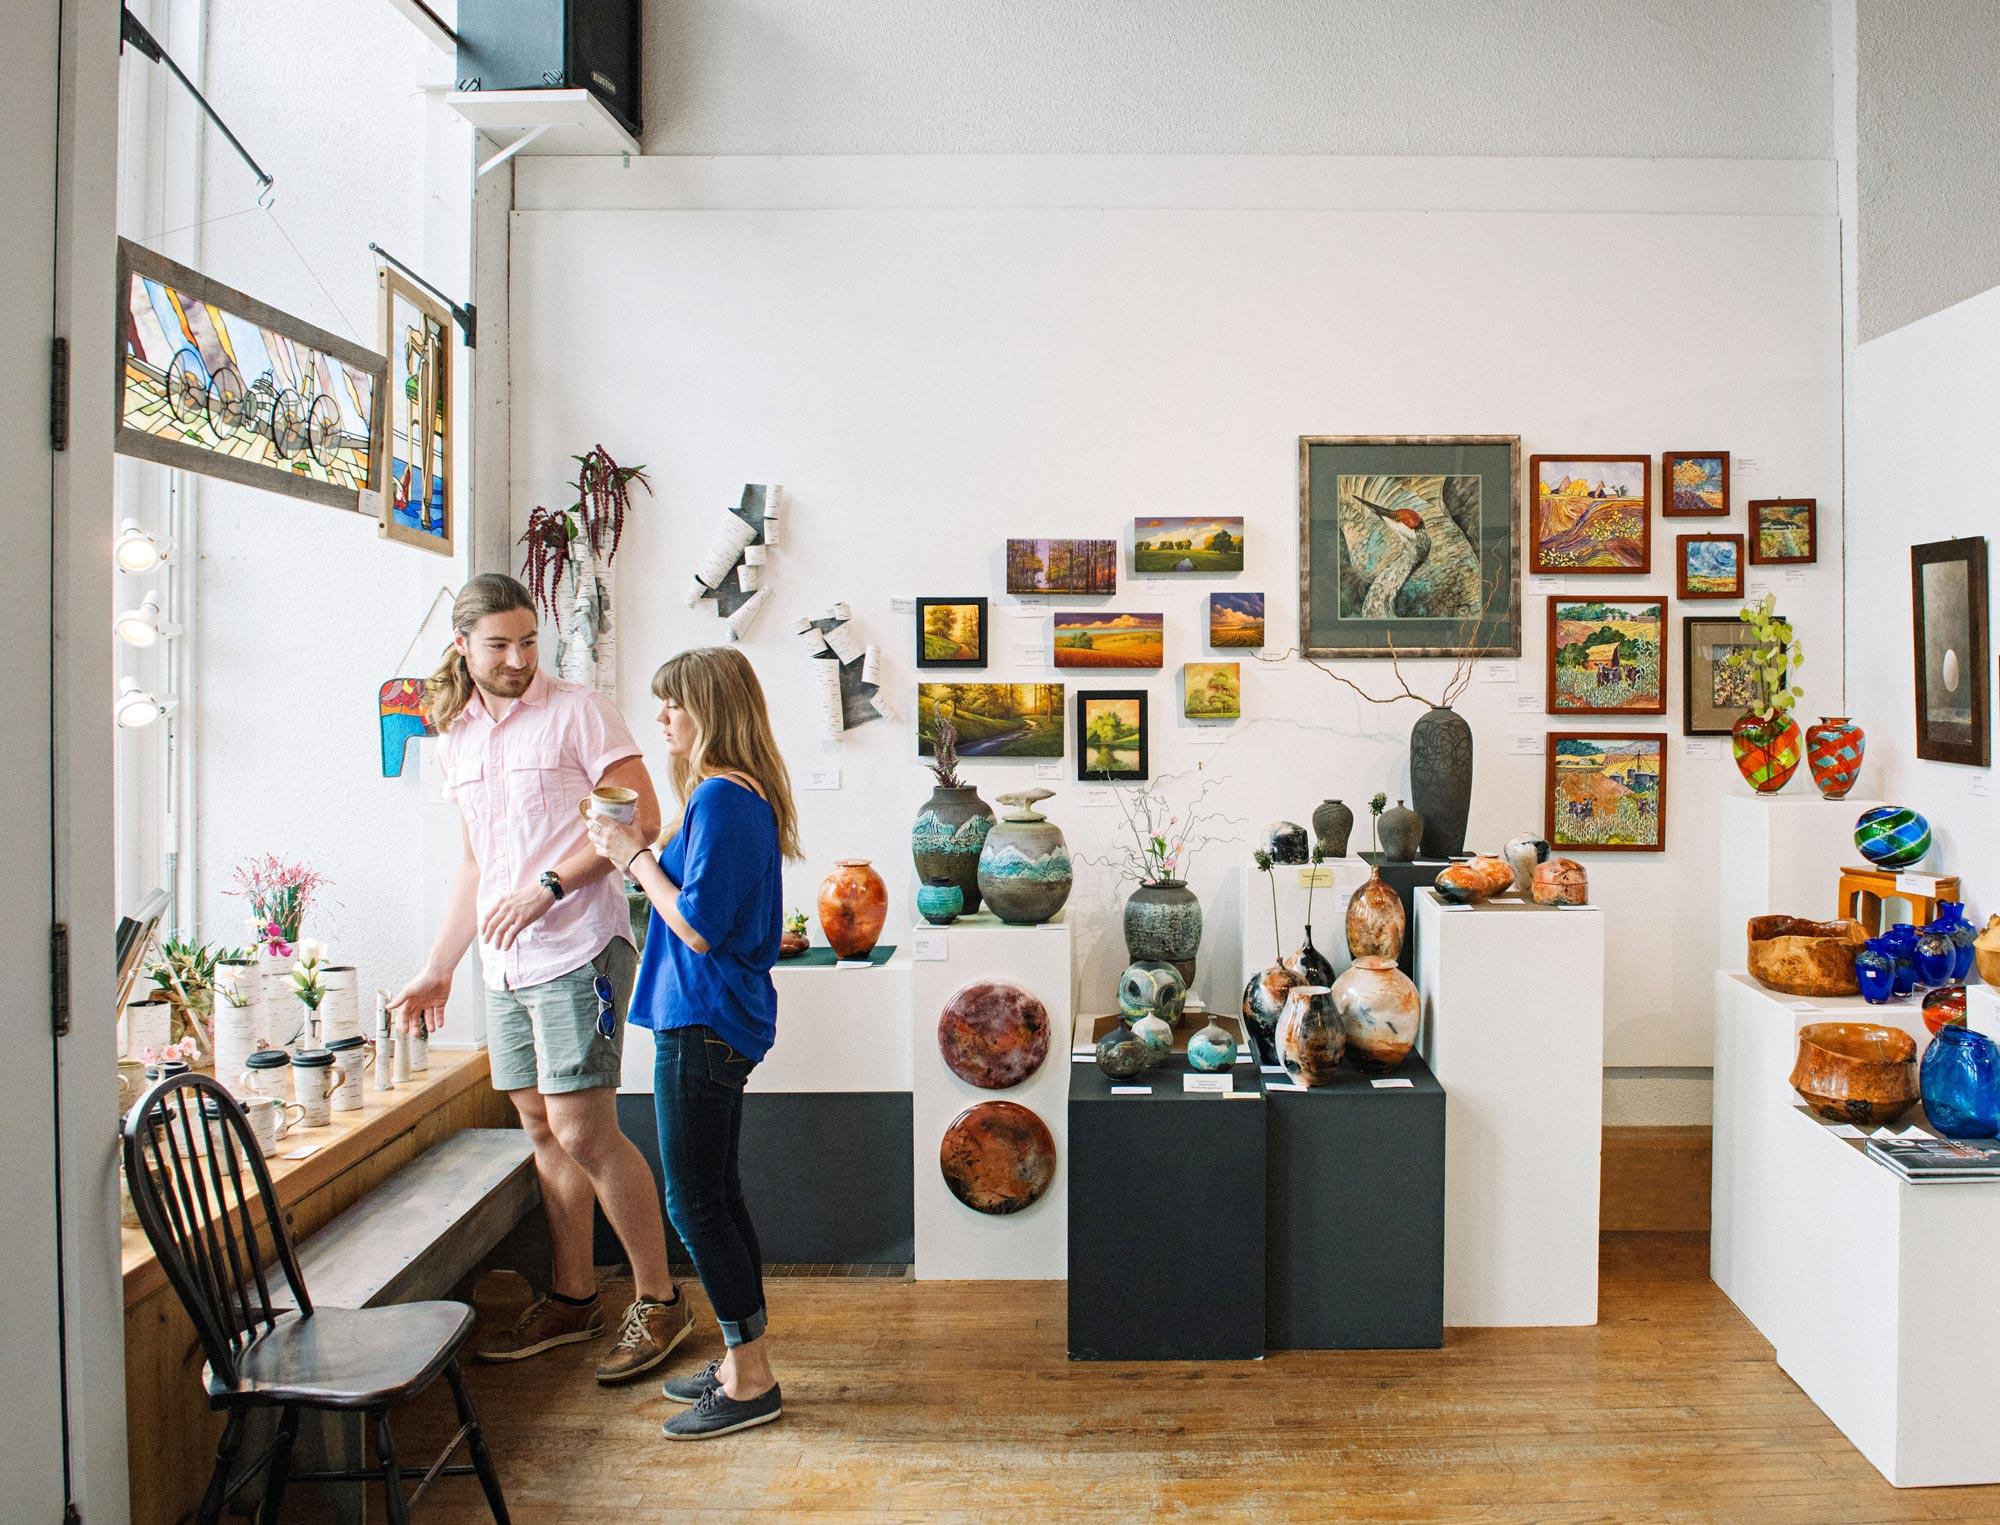 Lanesboro Arts gallery